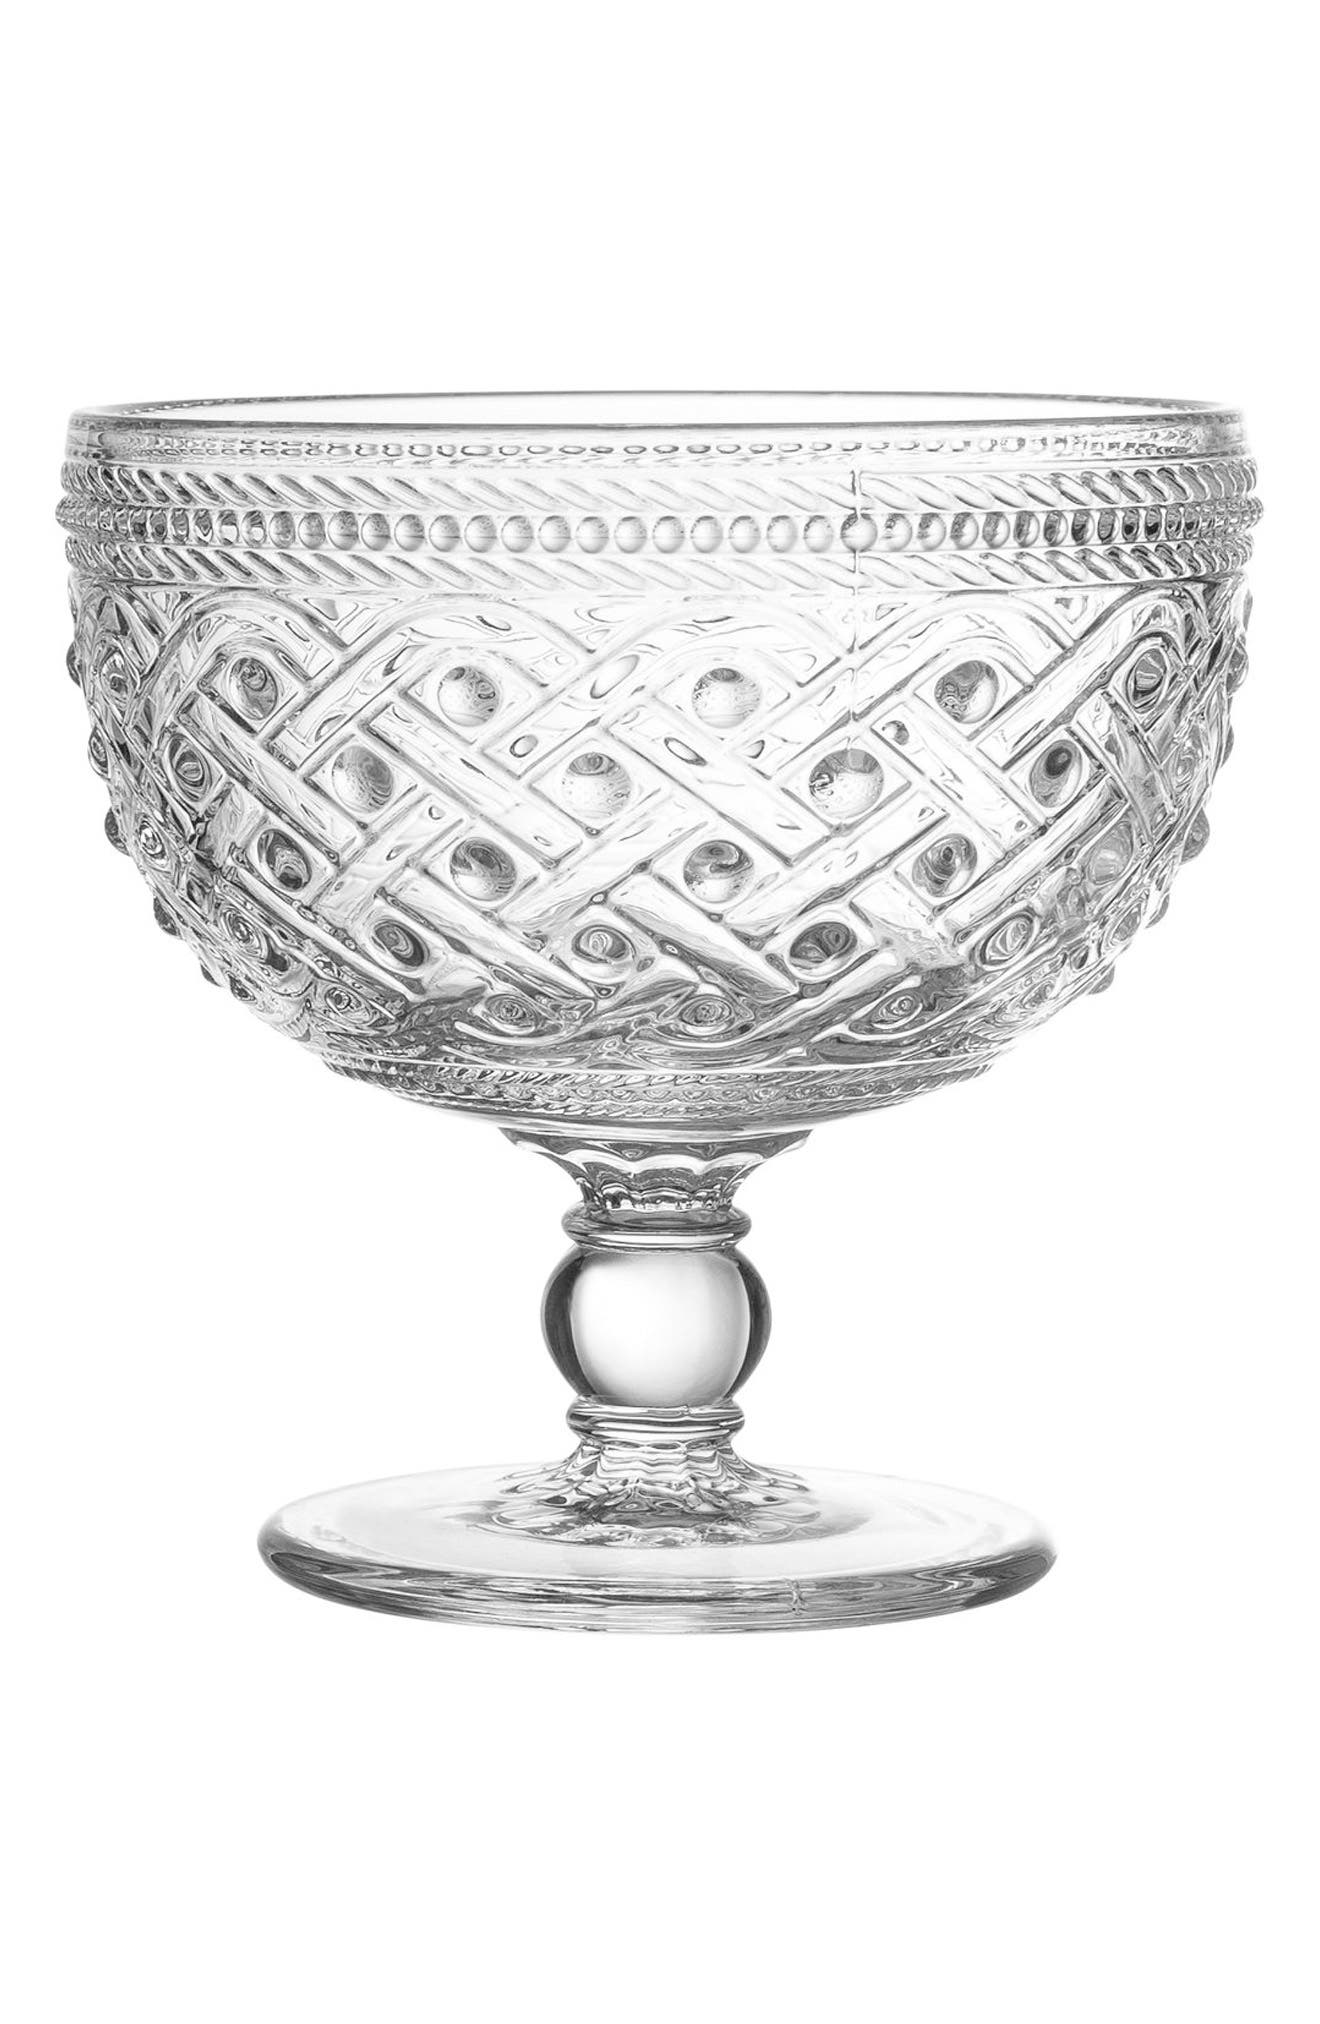 Bistro Ikat Set of 4 Pedestal Bowls,                             Main thumbnail 1, color,                             100